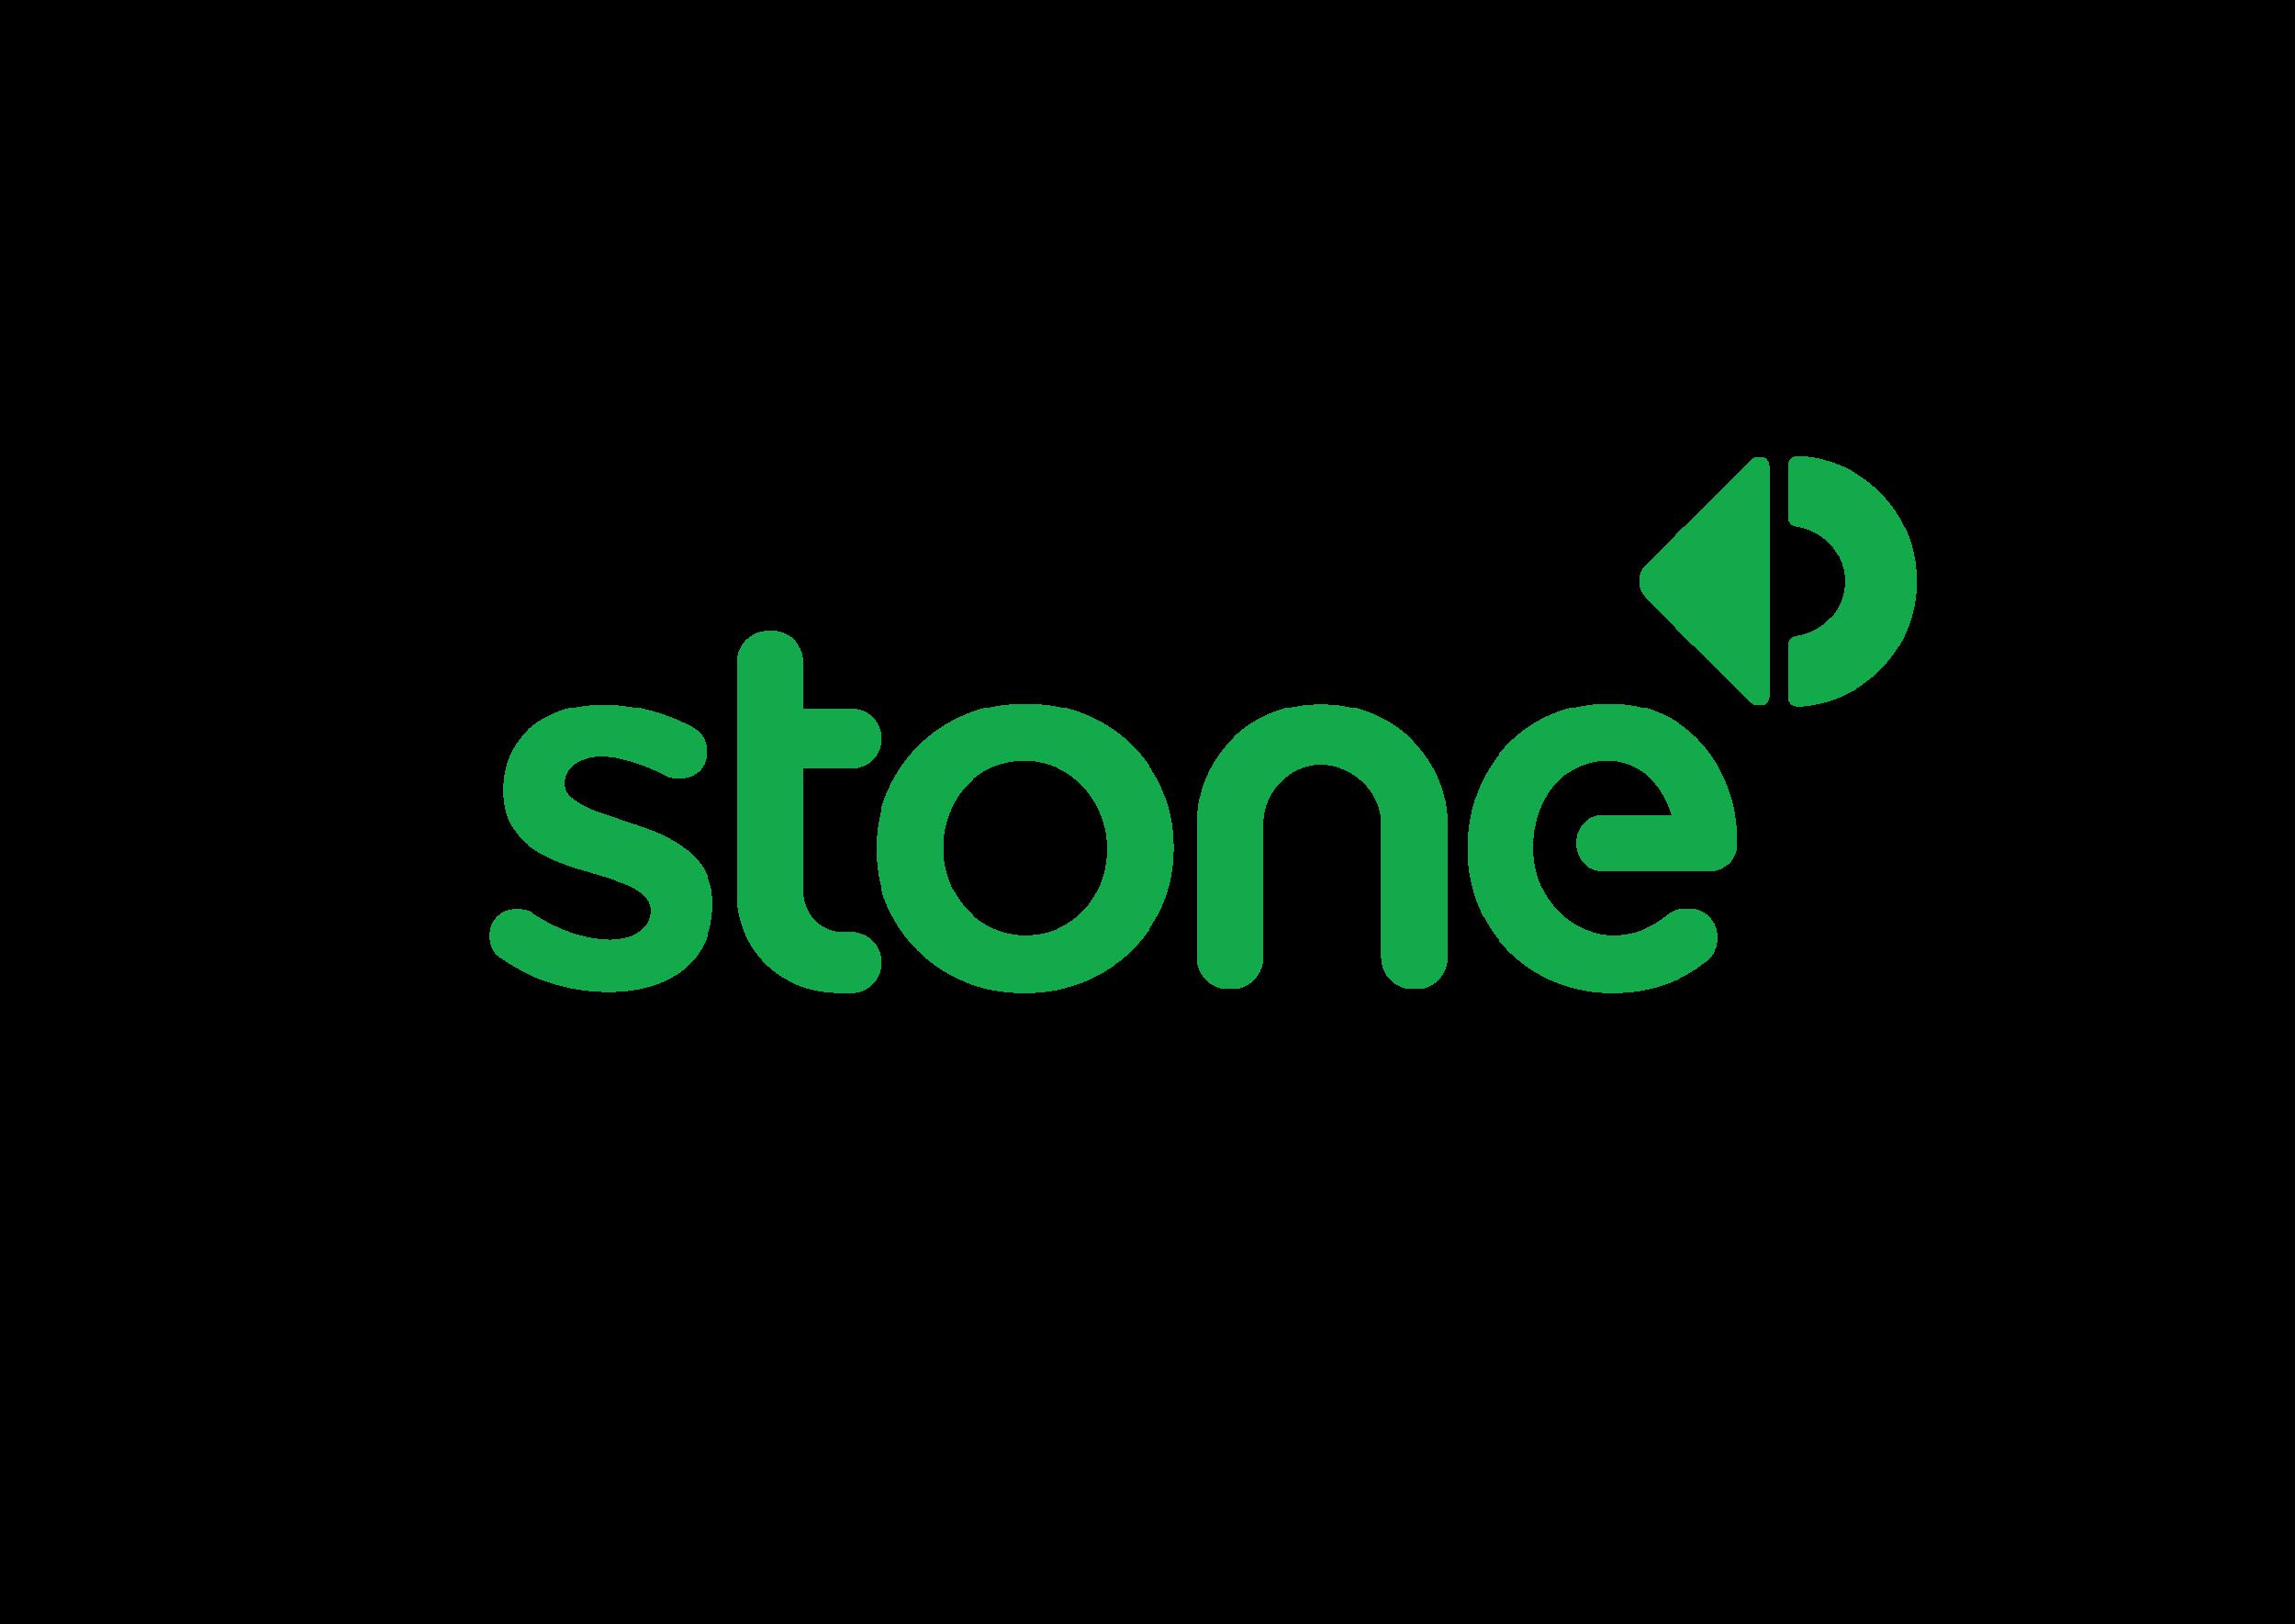 Logo-Stone.png